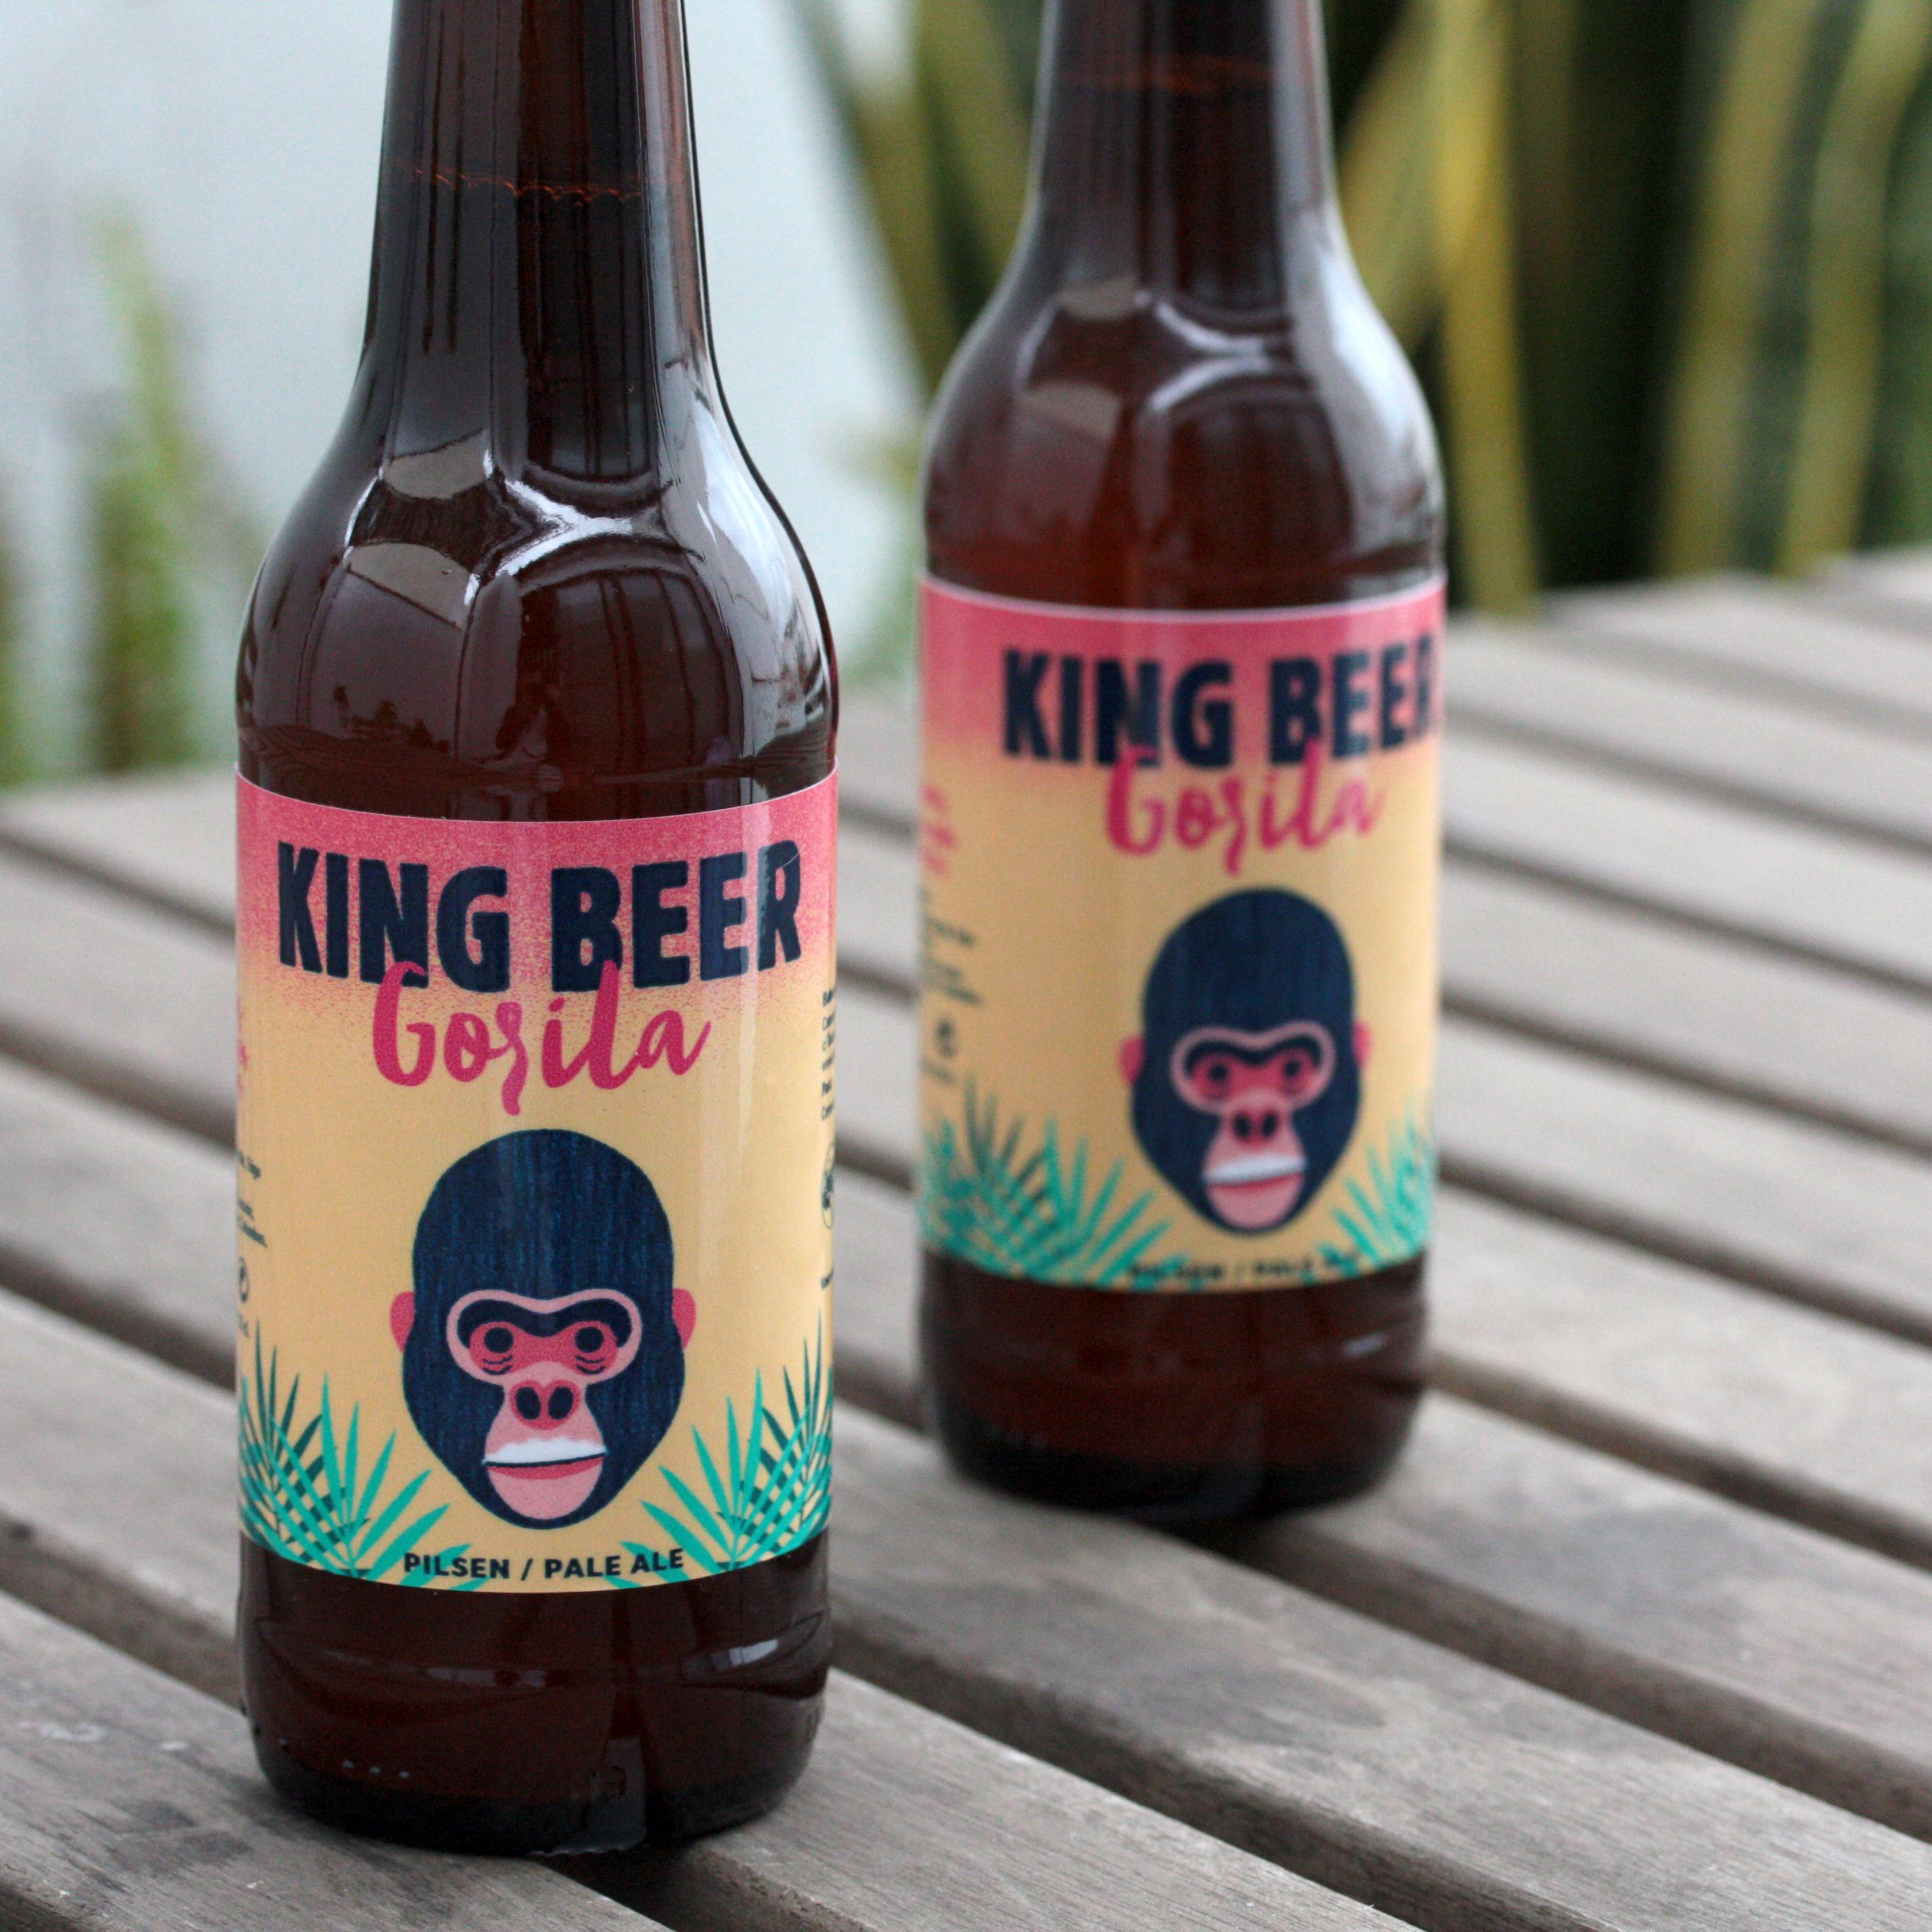 Daniel Diosdado: King Beer Gorila